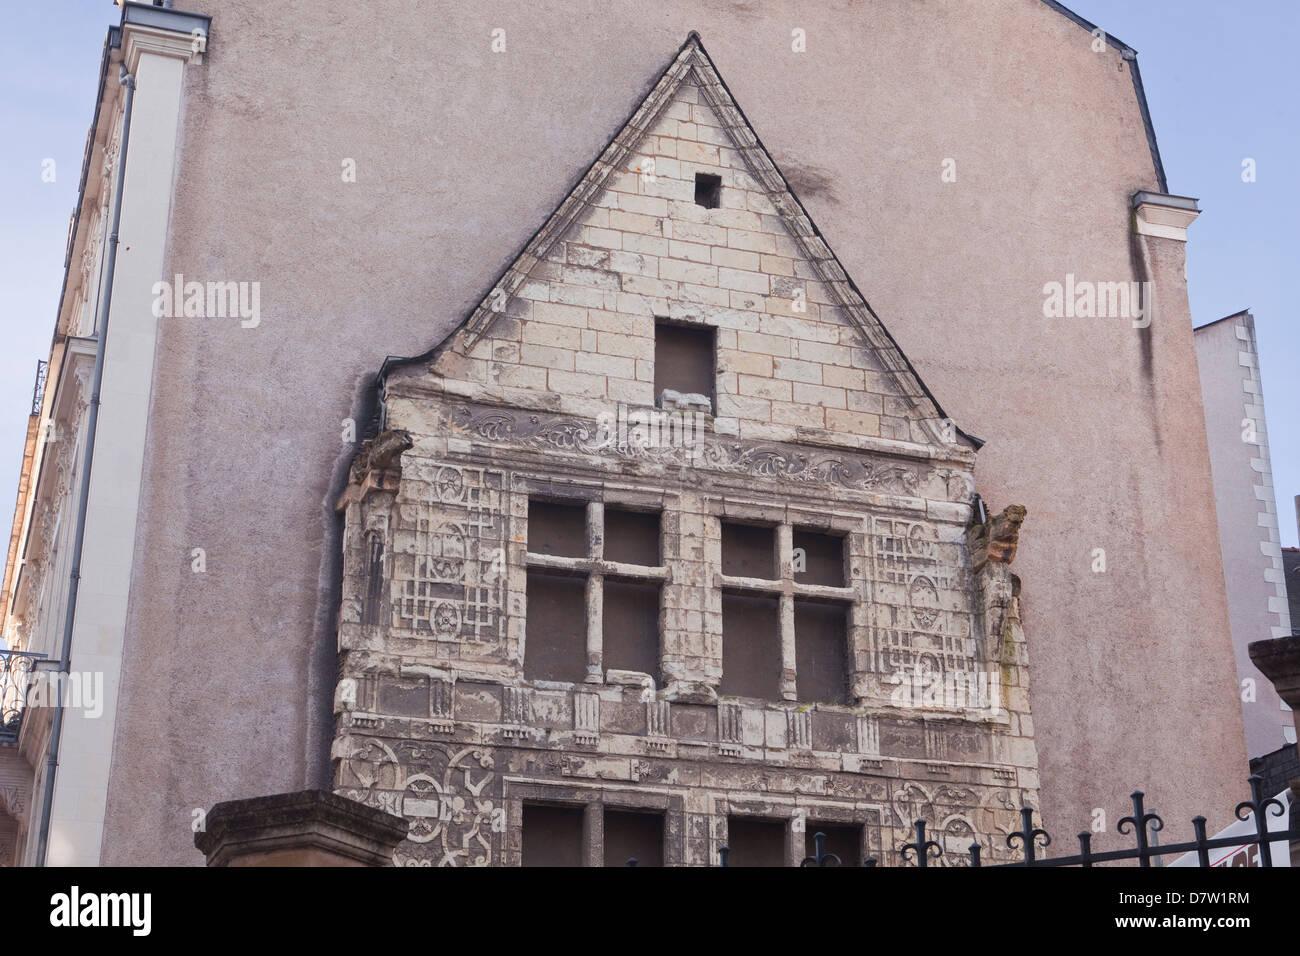 Parte del Logis Pince in Angers, Maine-et-Loire, Francia Immagini Stock